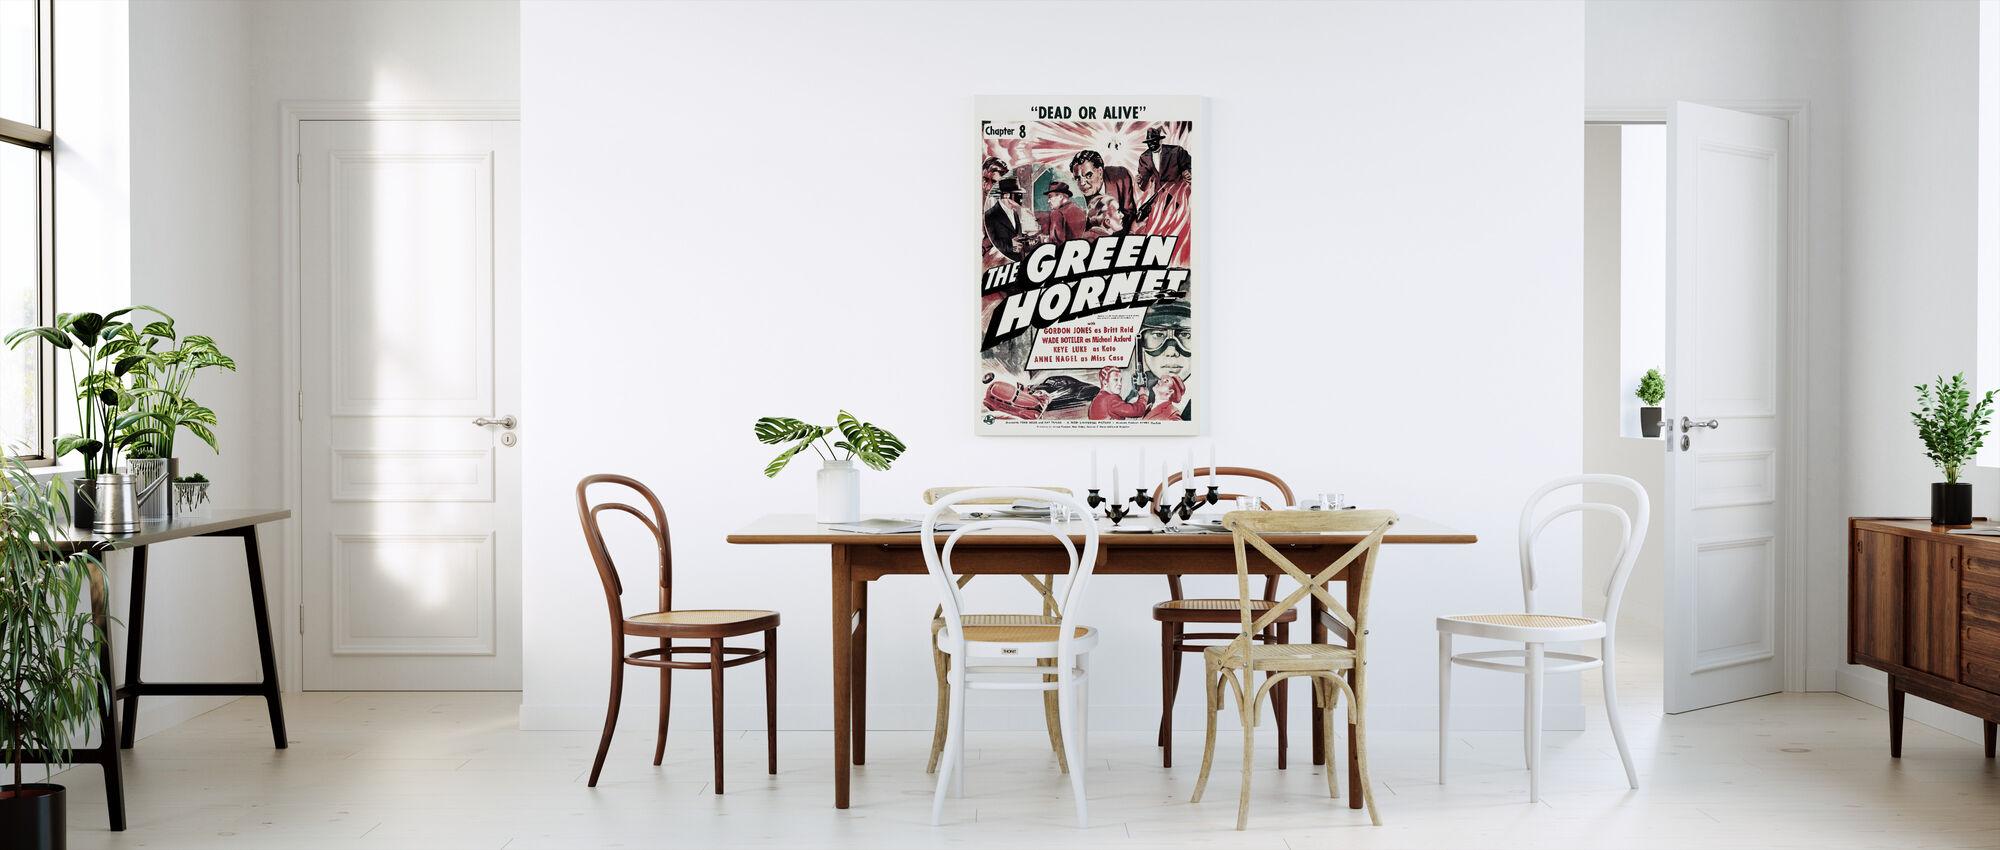 movie poster the green hornet surprendre avec une impression sur toile photowall. Black Bedroom Furniture Sets. Home Design Ideas